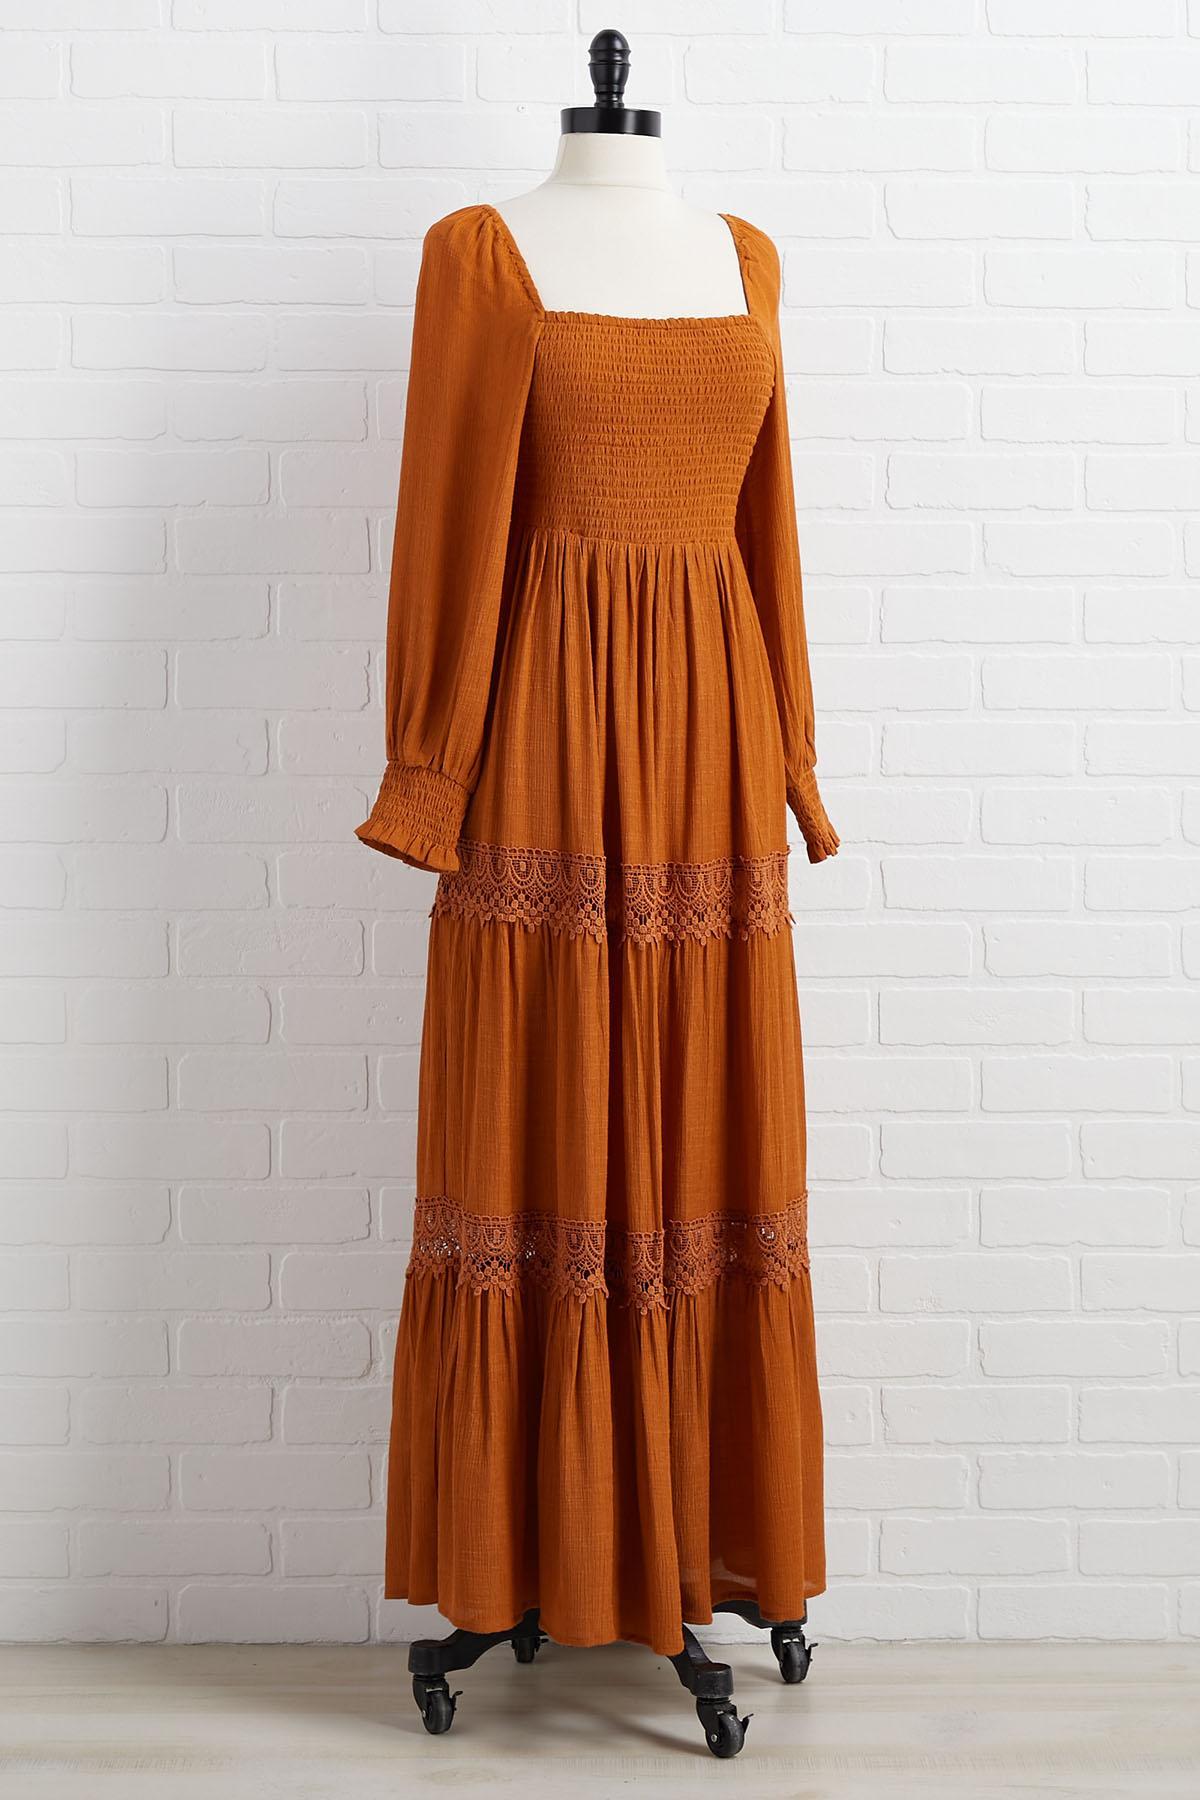 Hopes And Prairie Dress